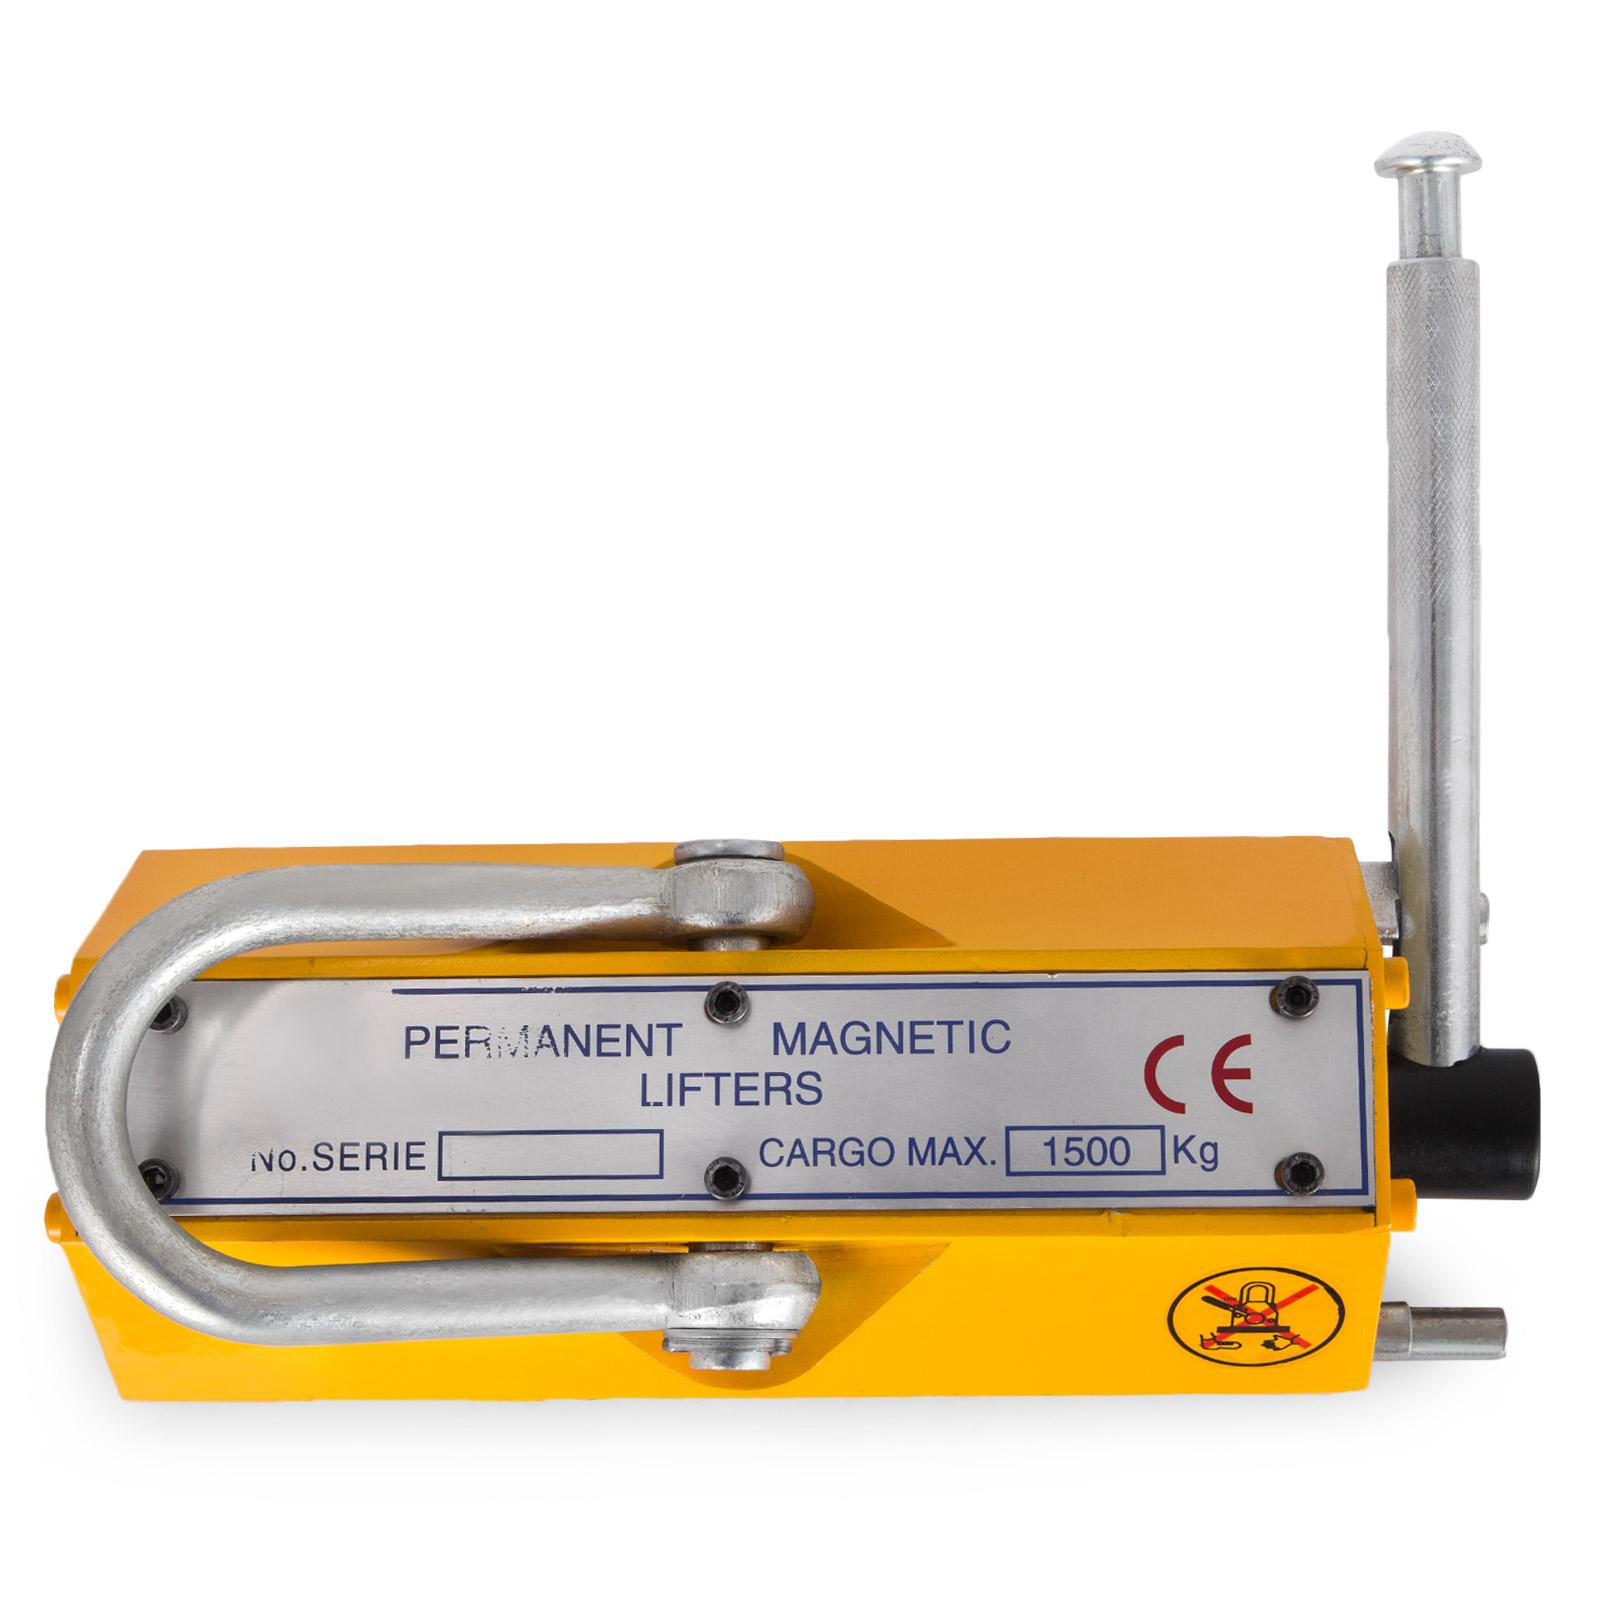 100-300-600-1000KG-Steel-Magnetic-Lifter-Heavy-Duty-Crane-Hoist-Lifting-Magnet miniature 77